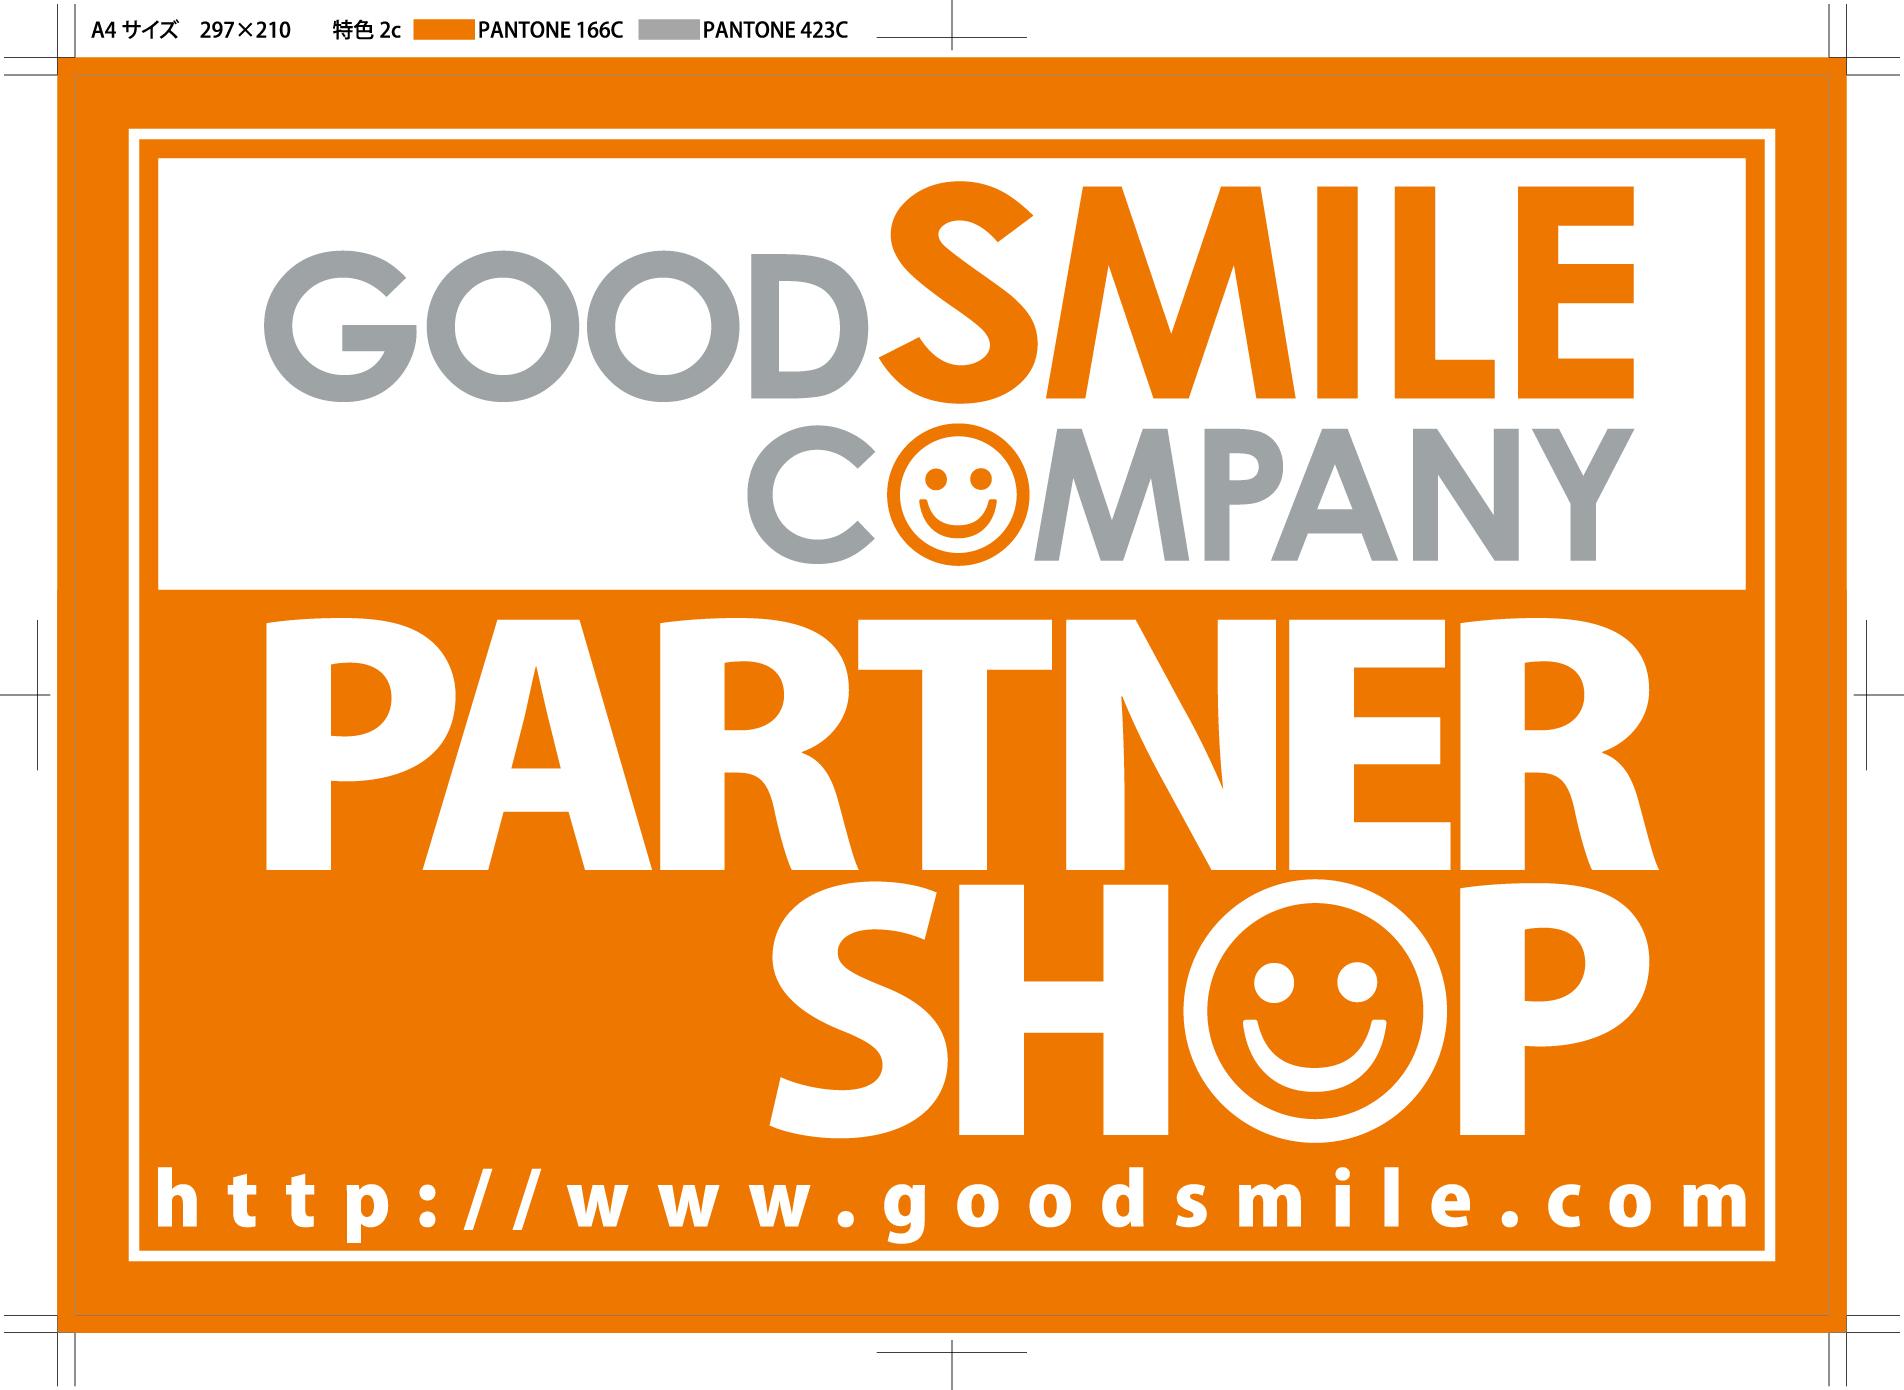 Good Smile Company